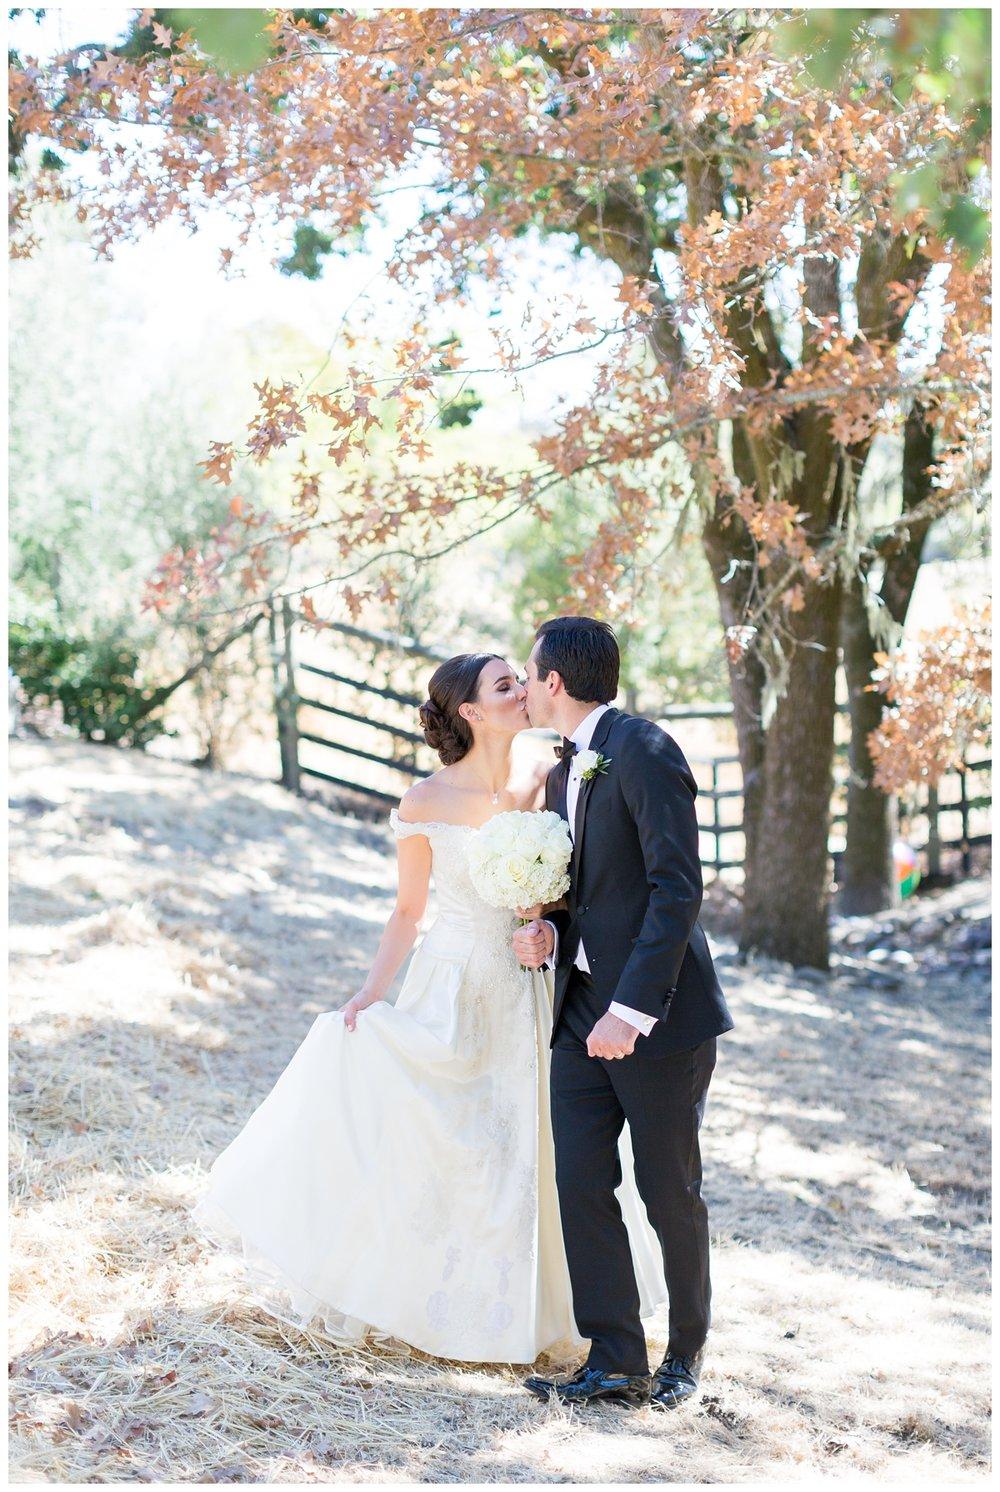 Jack-London-State-Park-Wedding-Photos_2631.jpg